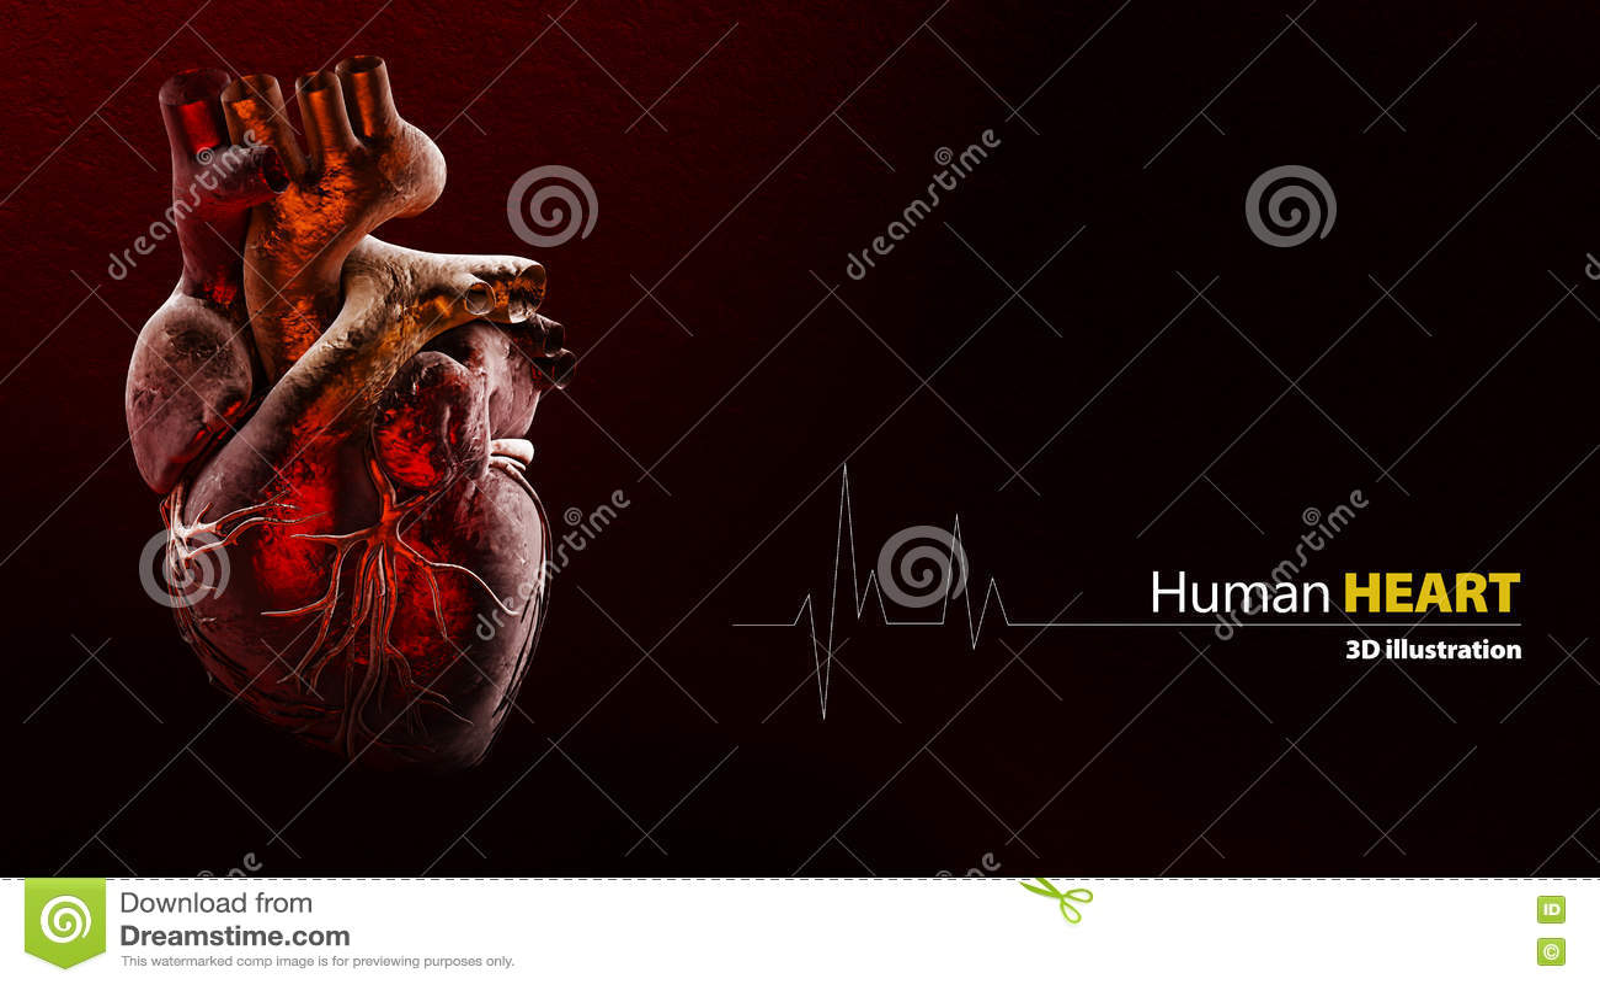 Anatomy of Human Heart